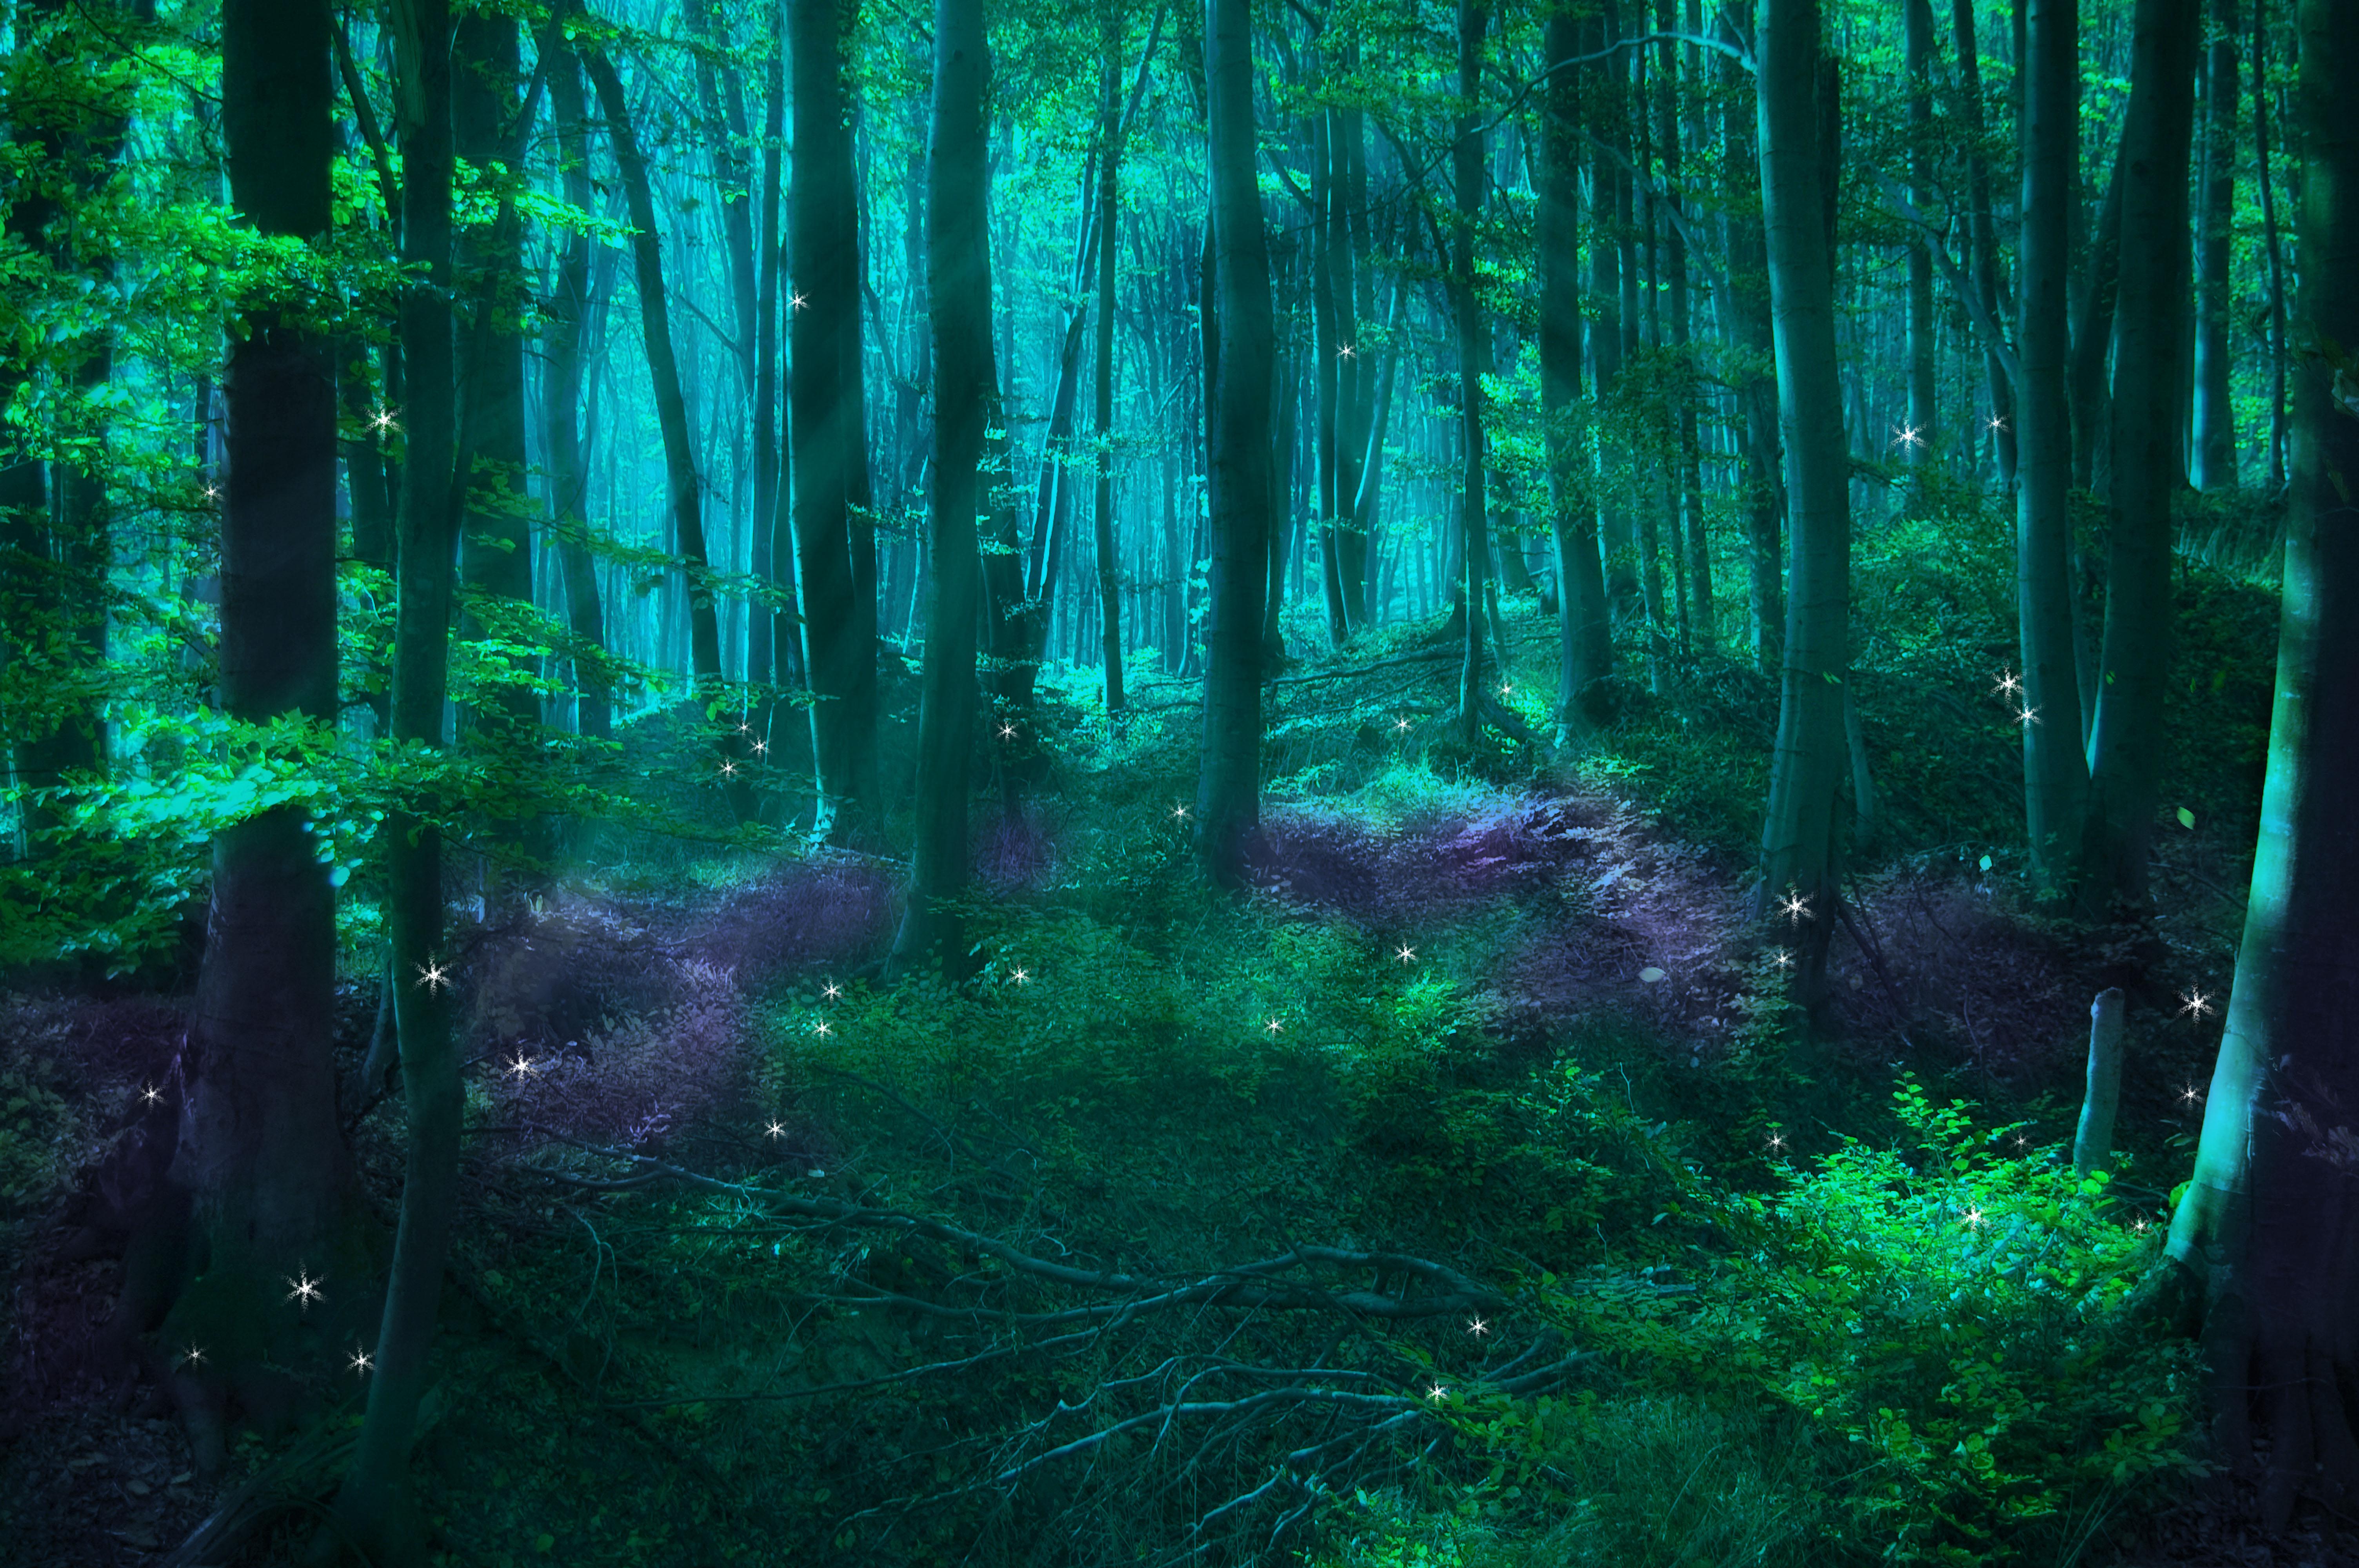 Enchanted Forest Wallpaper Wallpapersafari